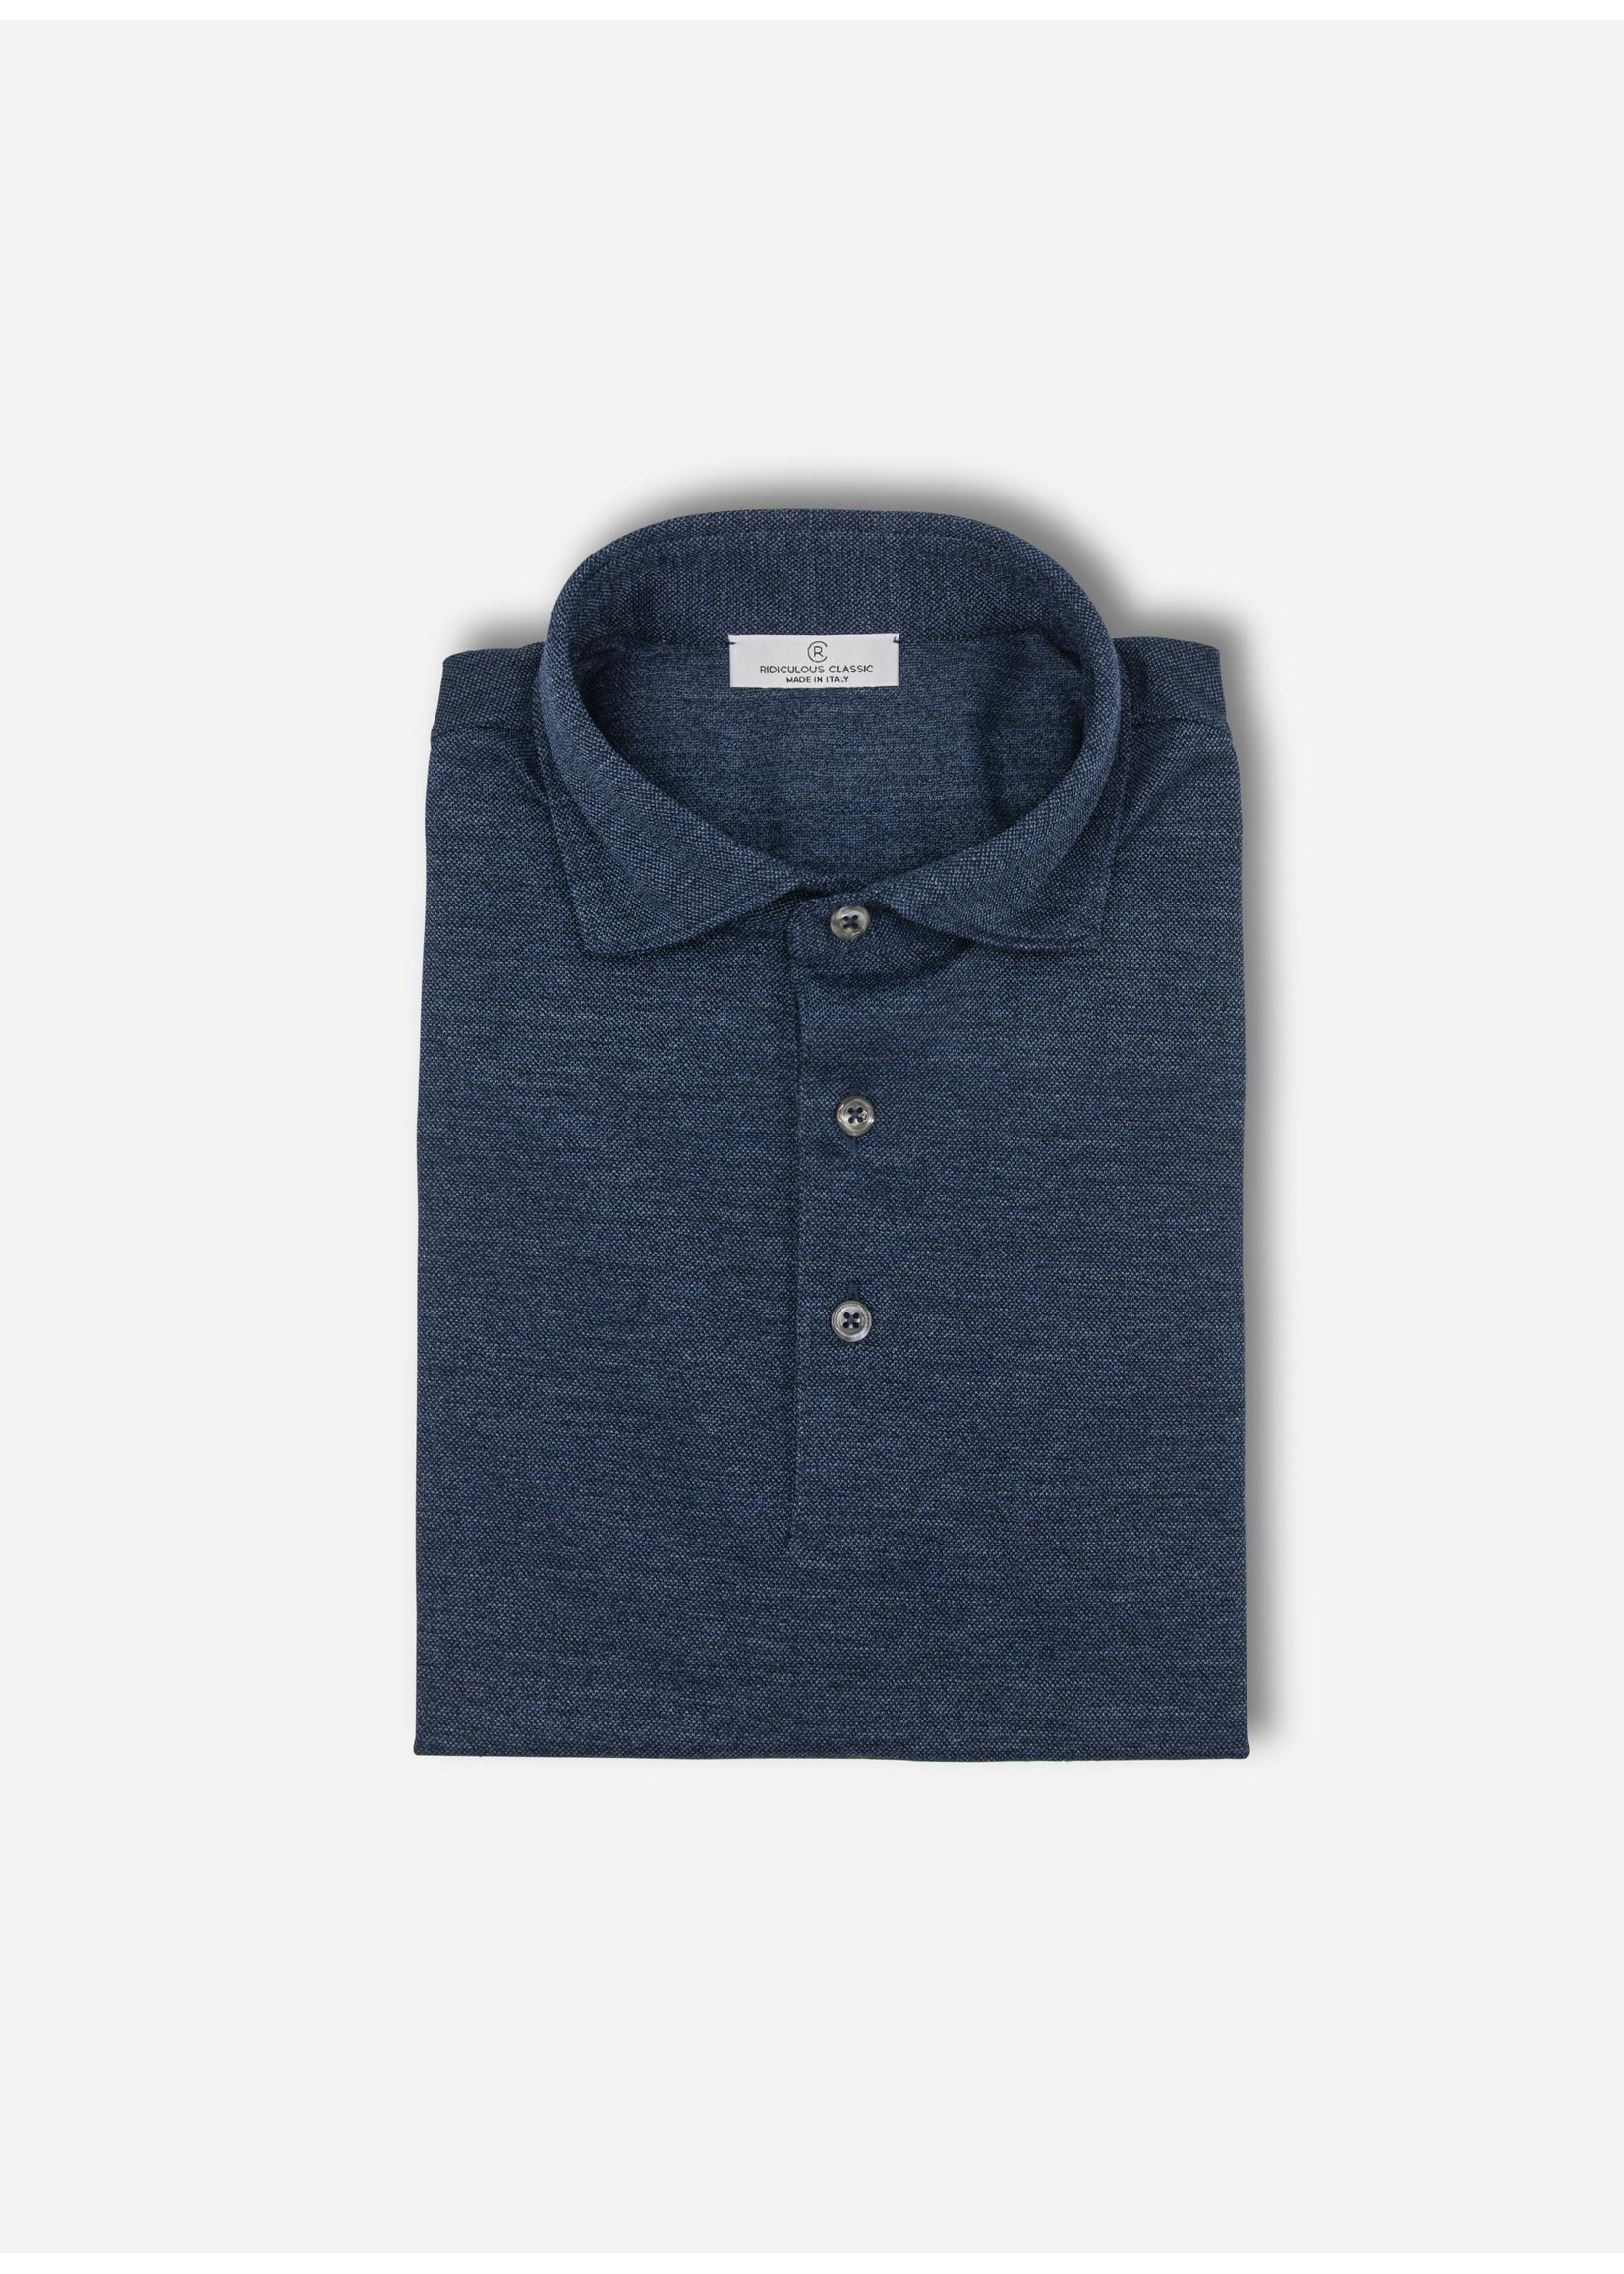 Ridiculous Classic Polo jeans blue pique